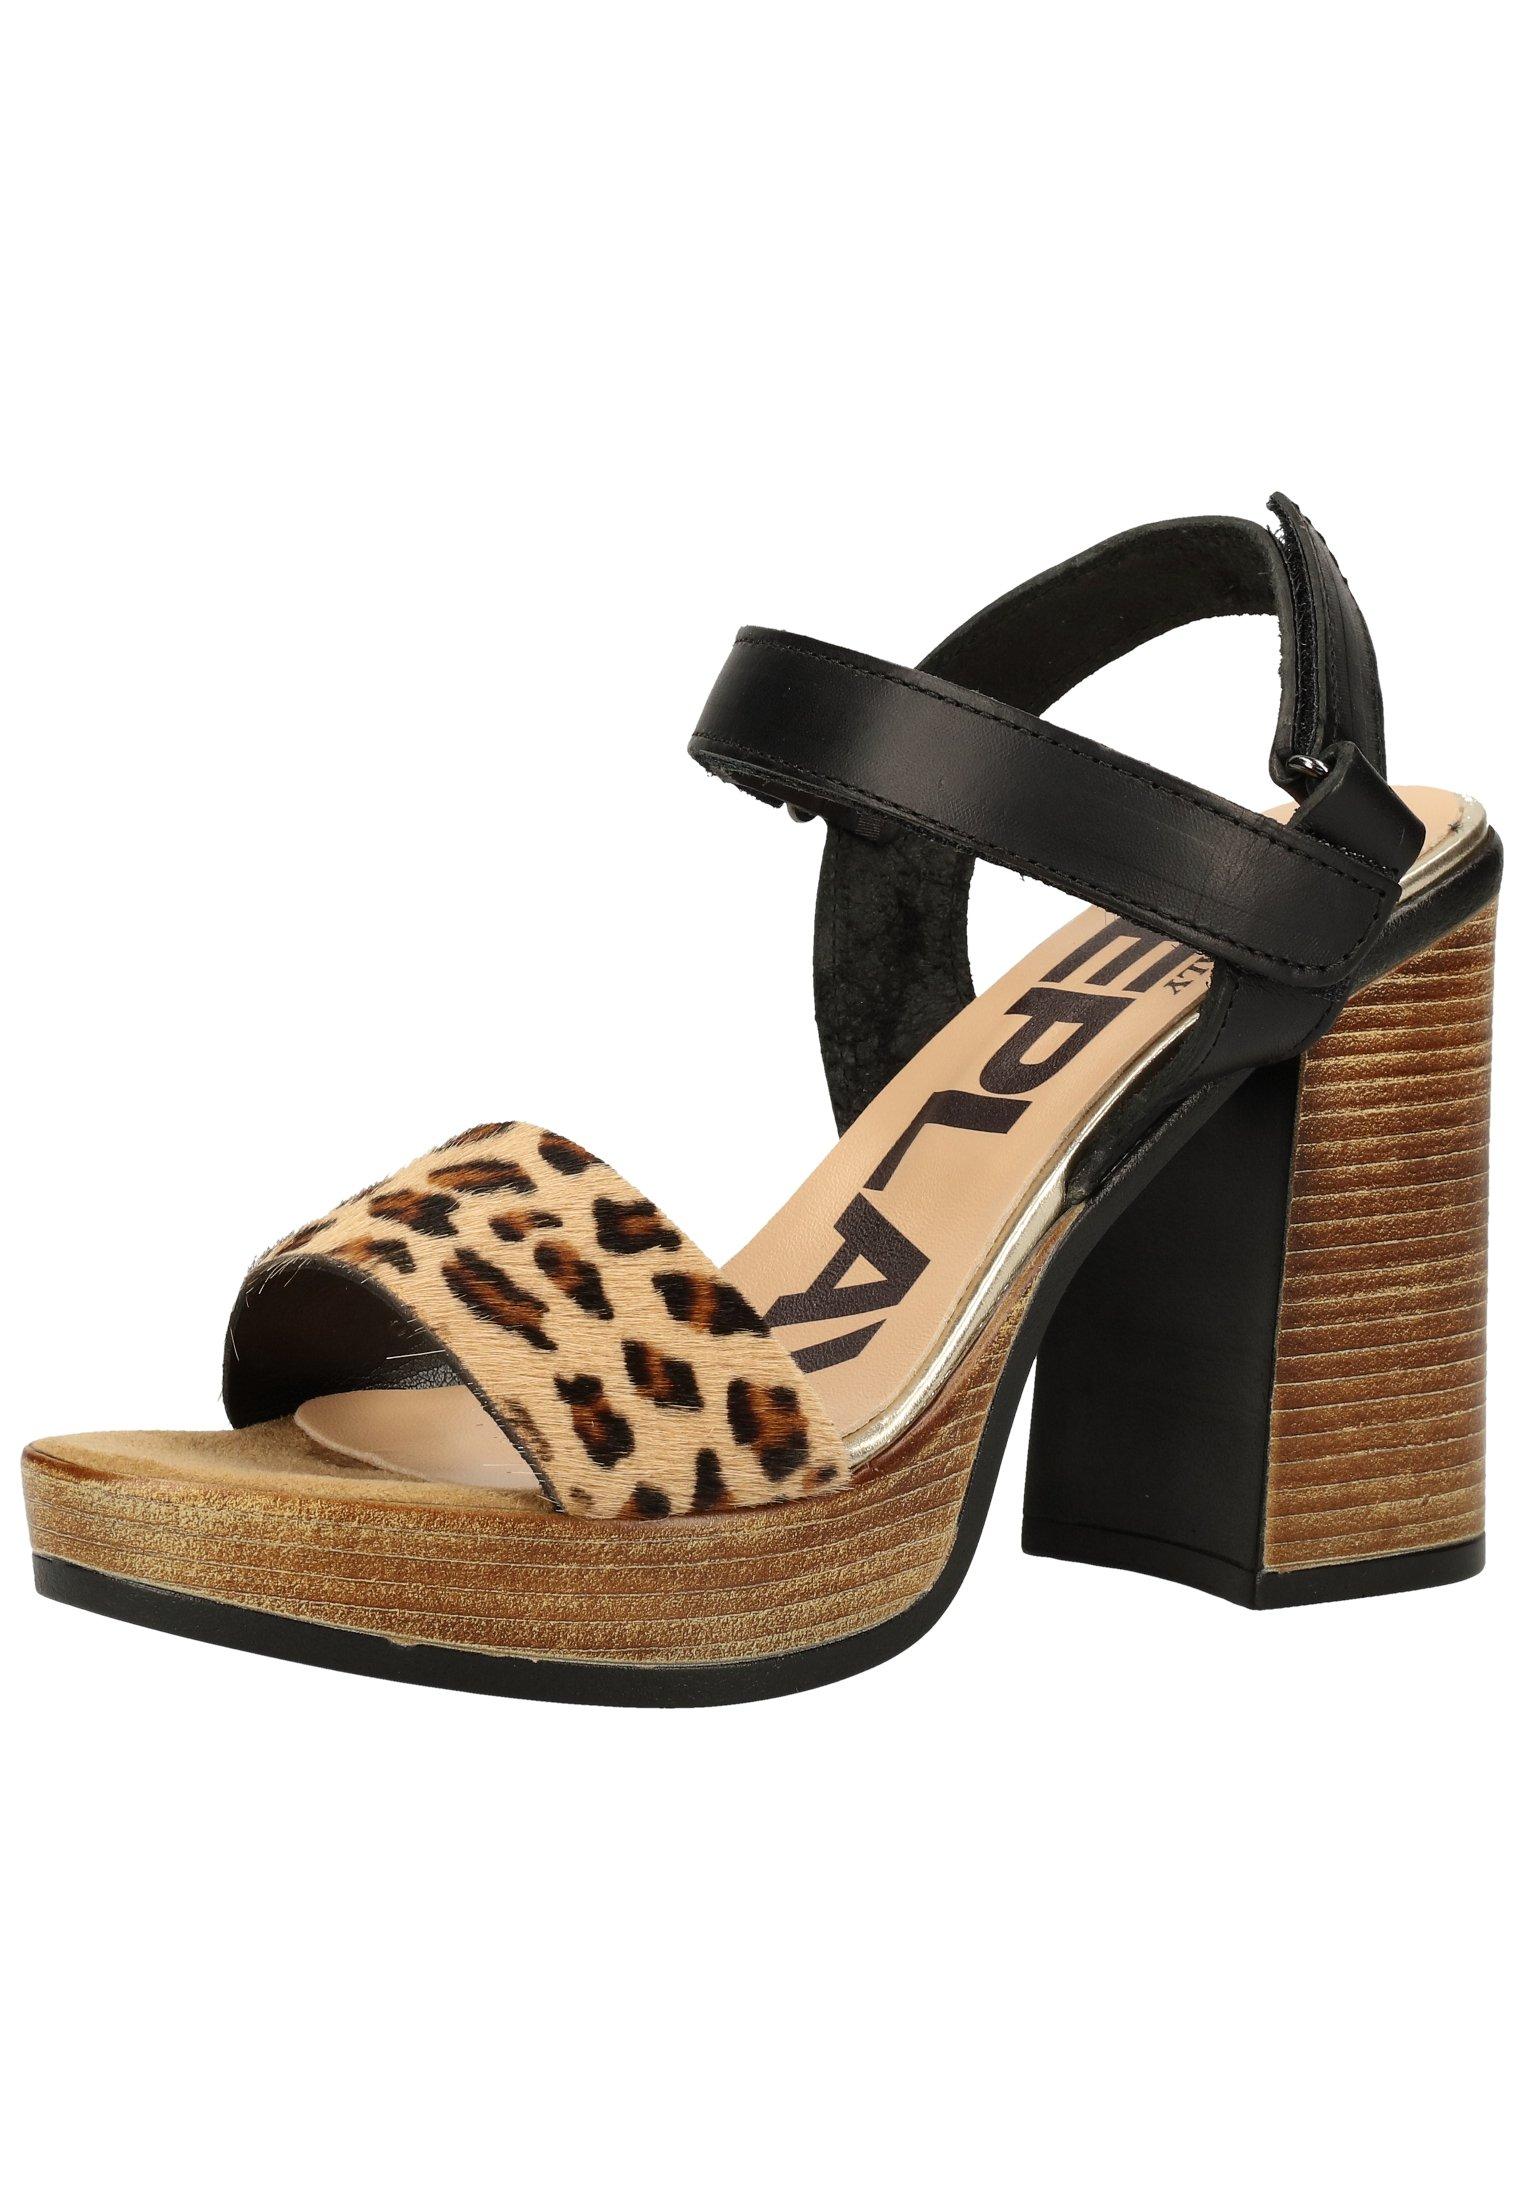 Replay Sandales à talons hauts - black leopard